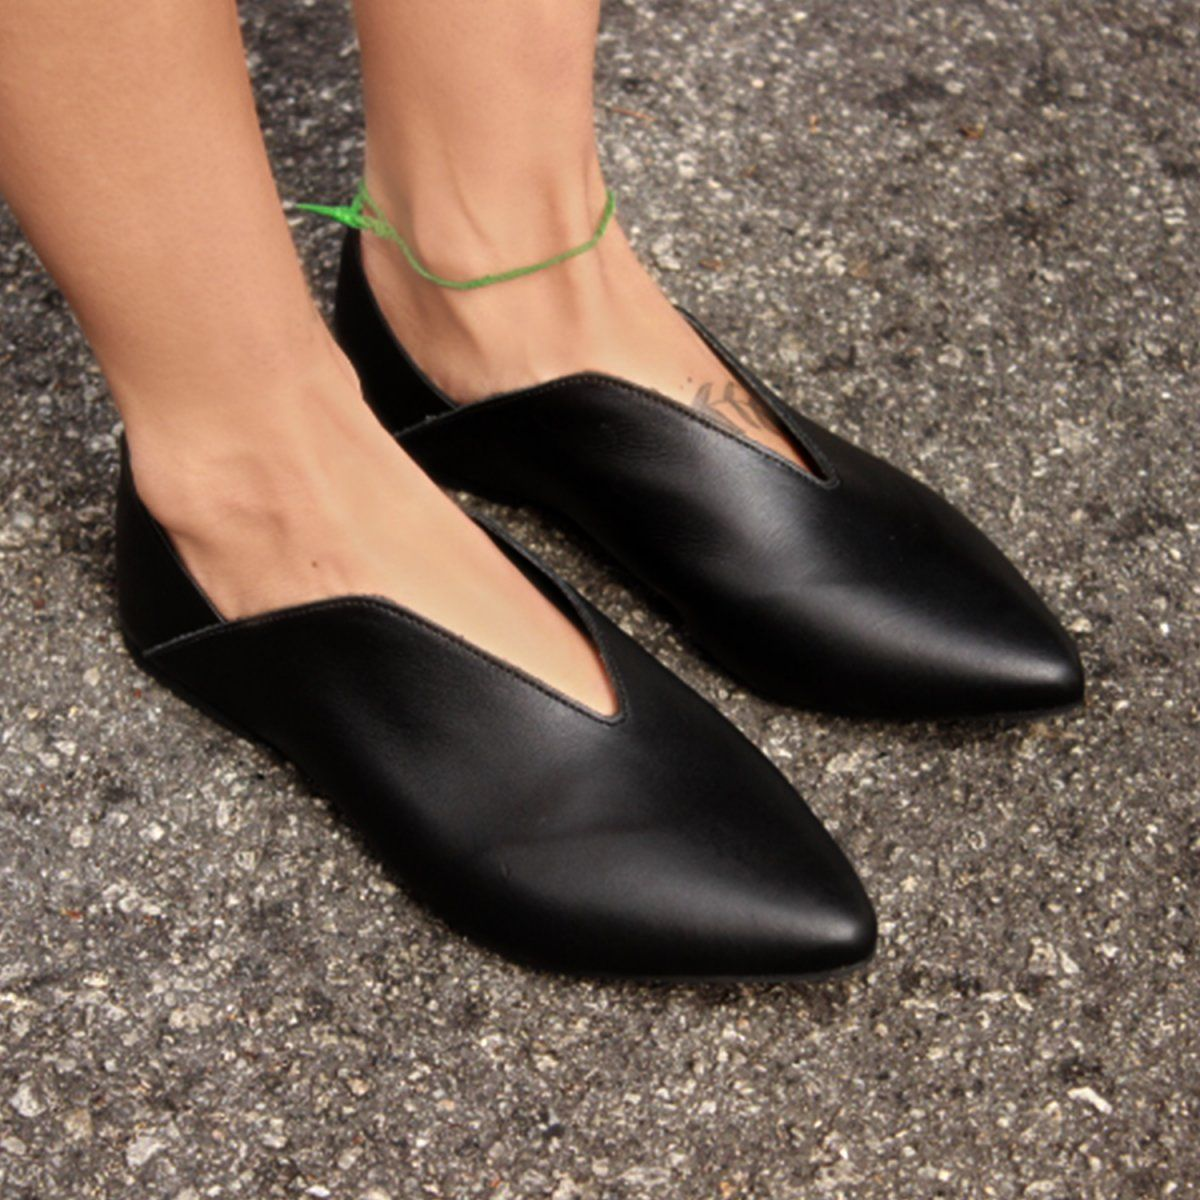 728e4c71f SAPATILHA V-NECK - Preto - Sapatilha V-neck - Wishin´ - Sapatos ...